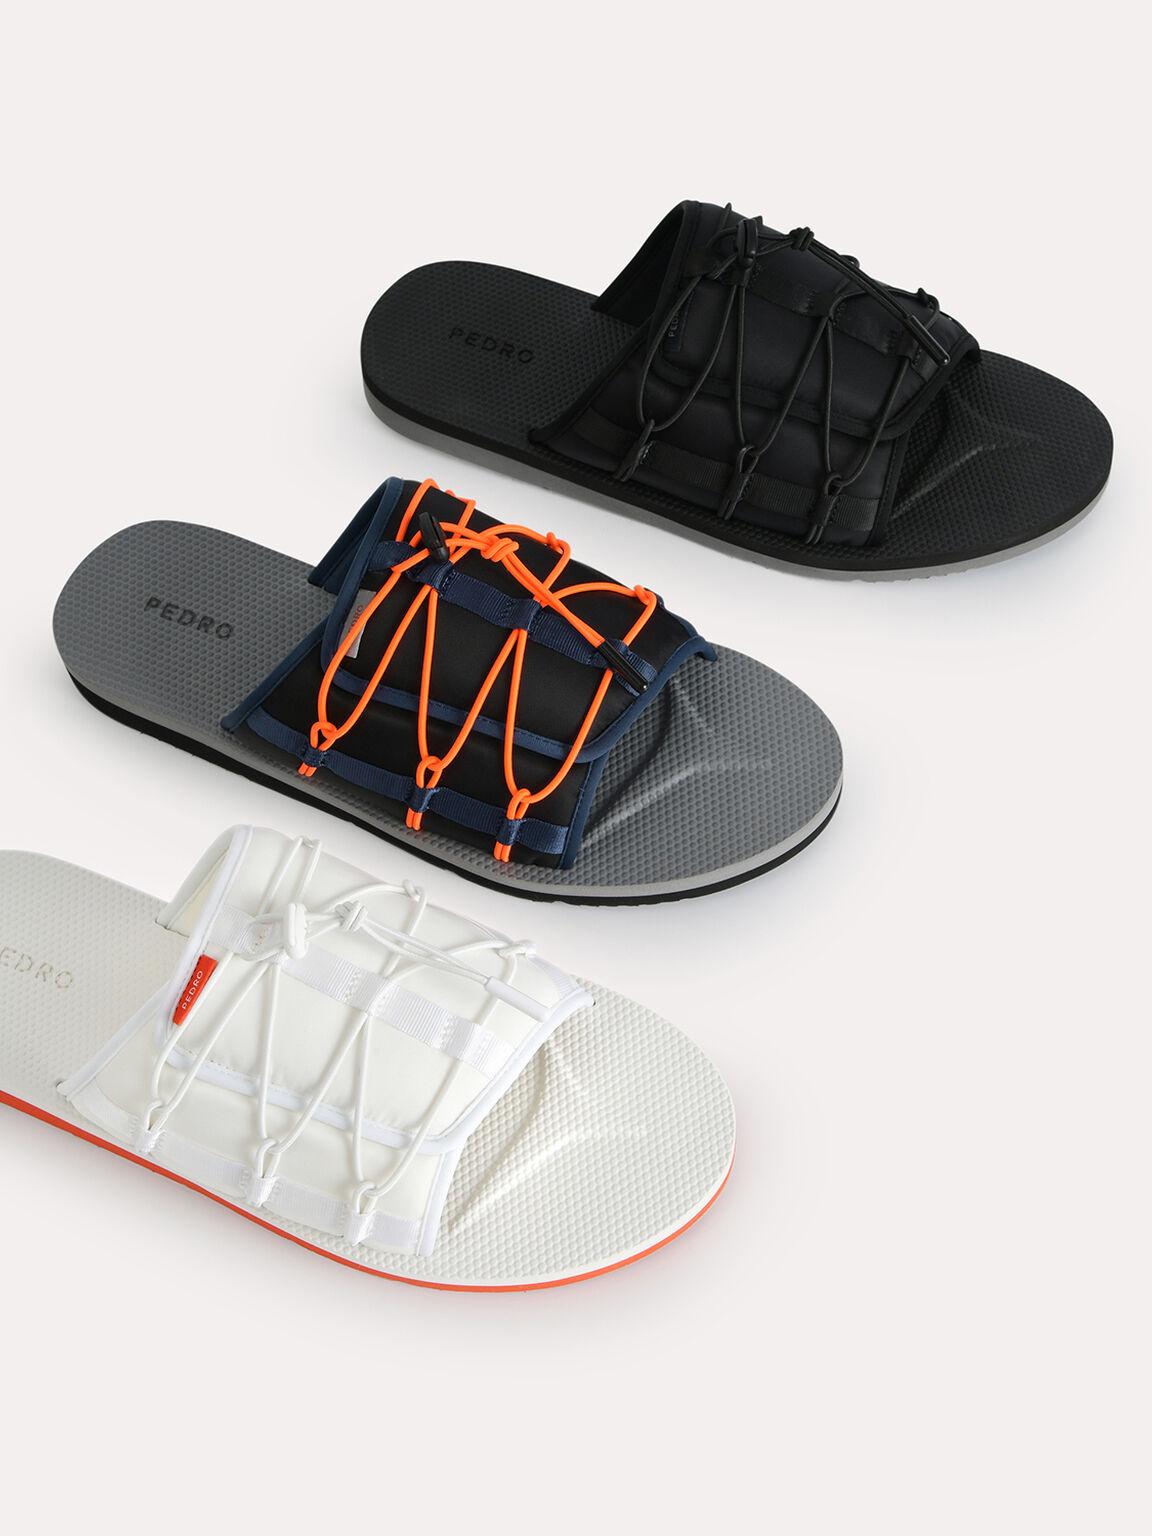 Nylon Slip-On Sandals, Multi, hi-res